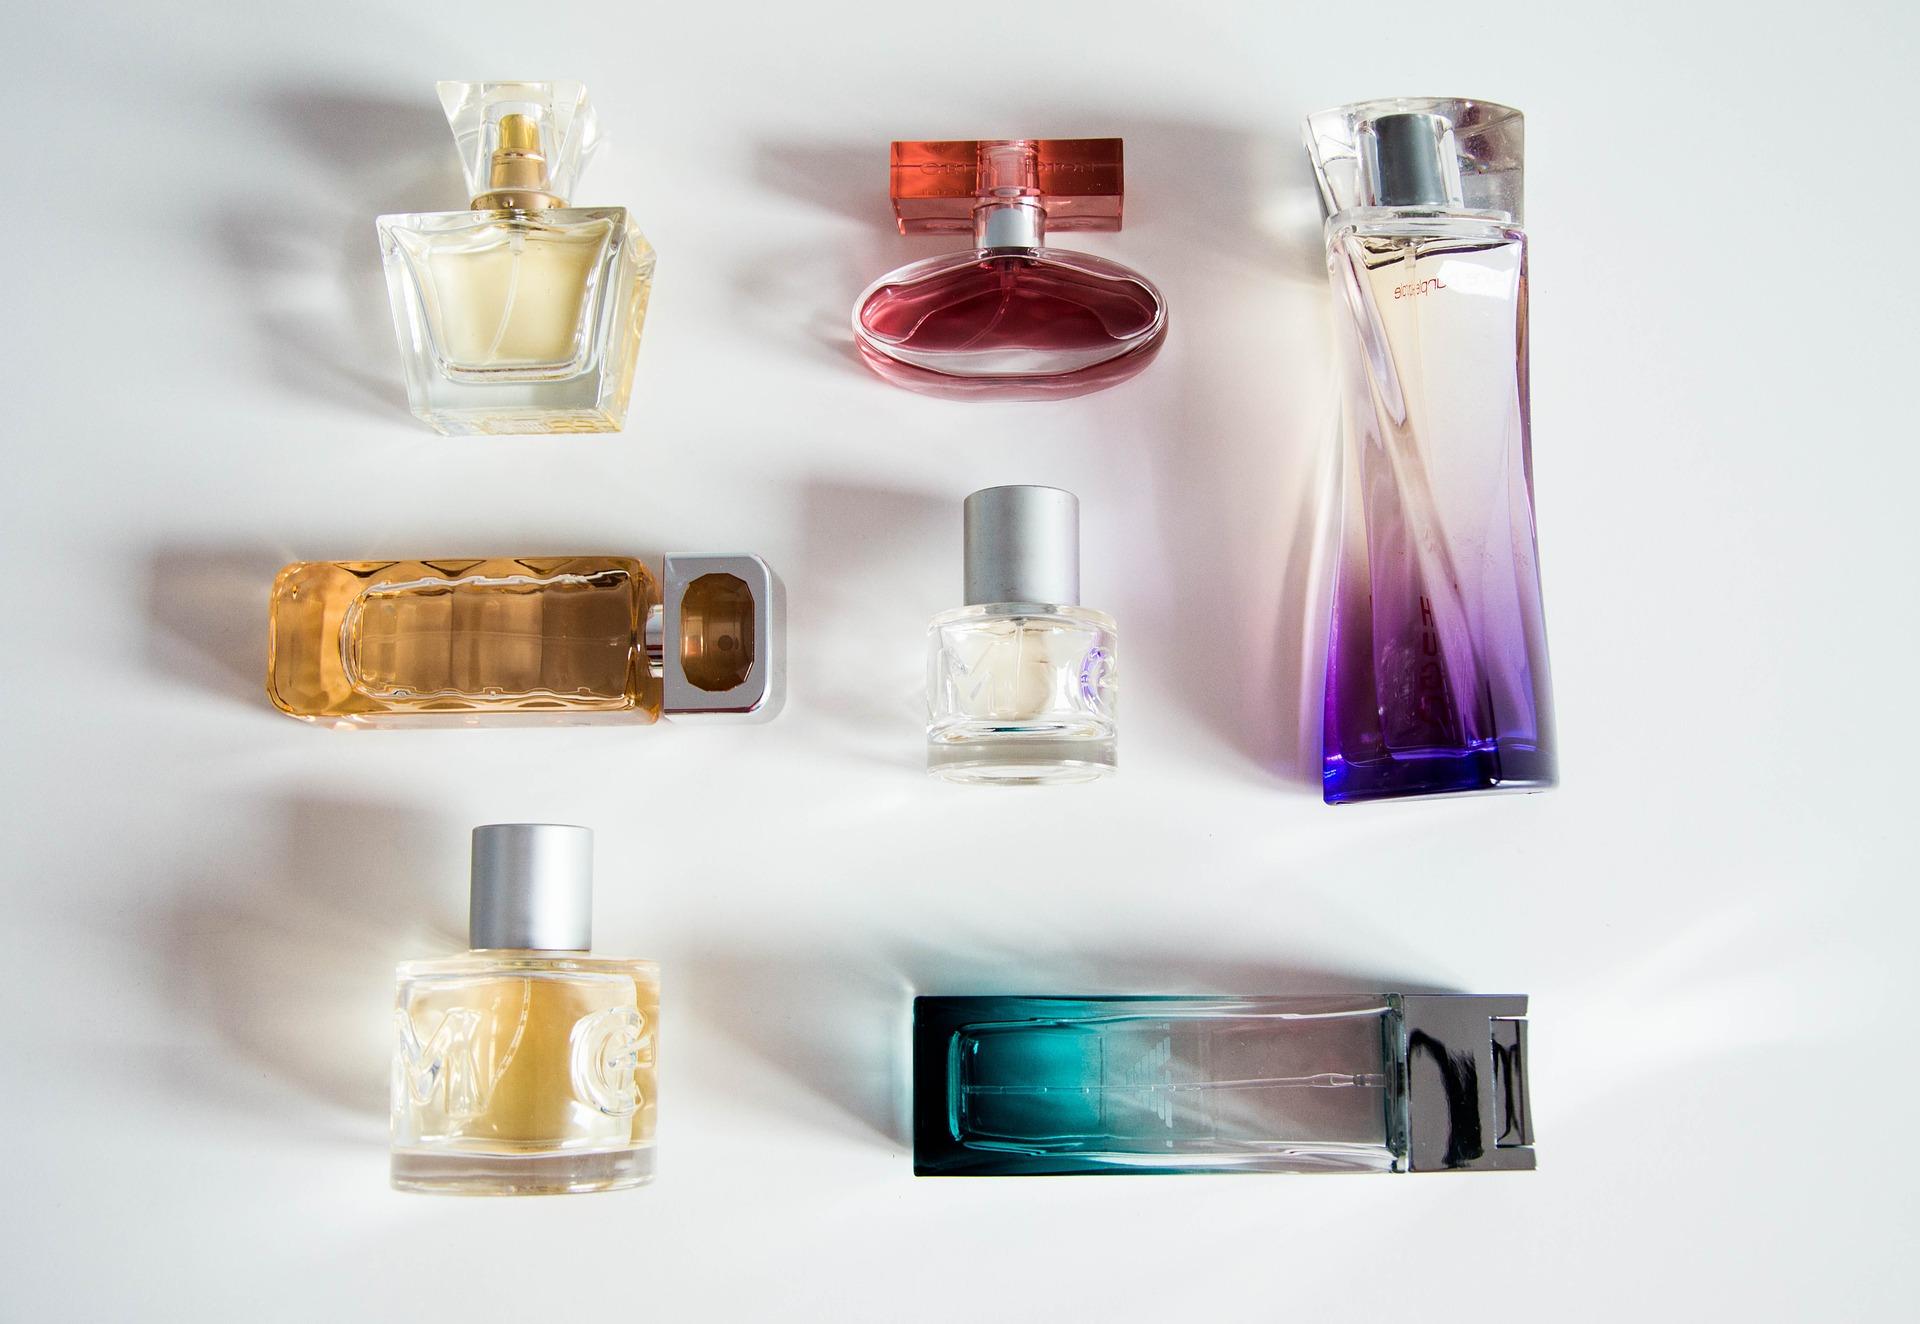 perfume-bottle-932146_1920